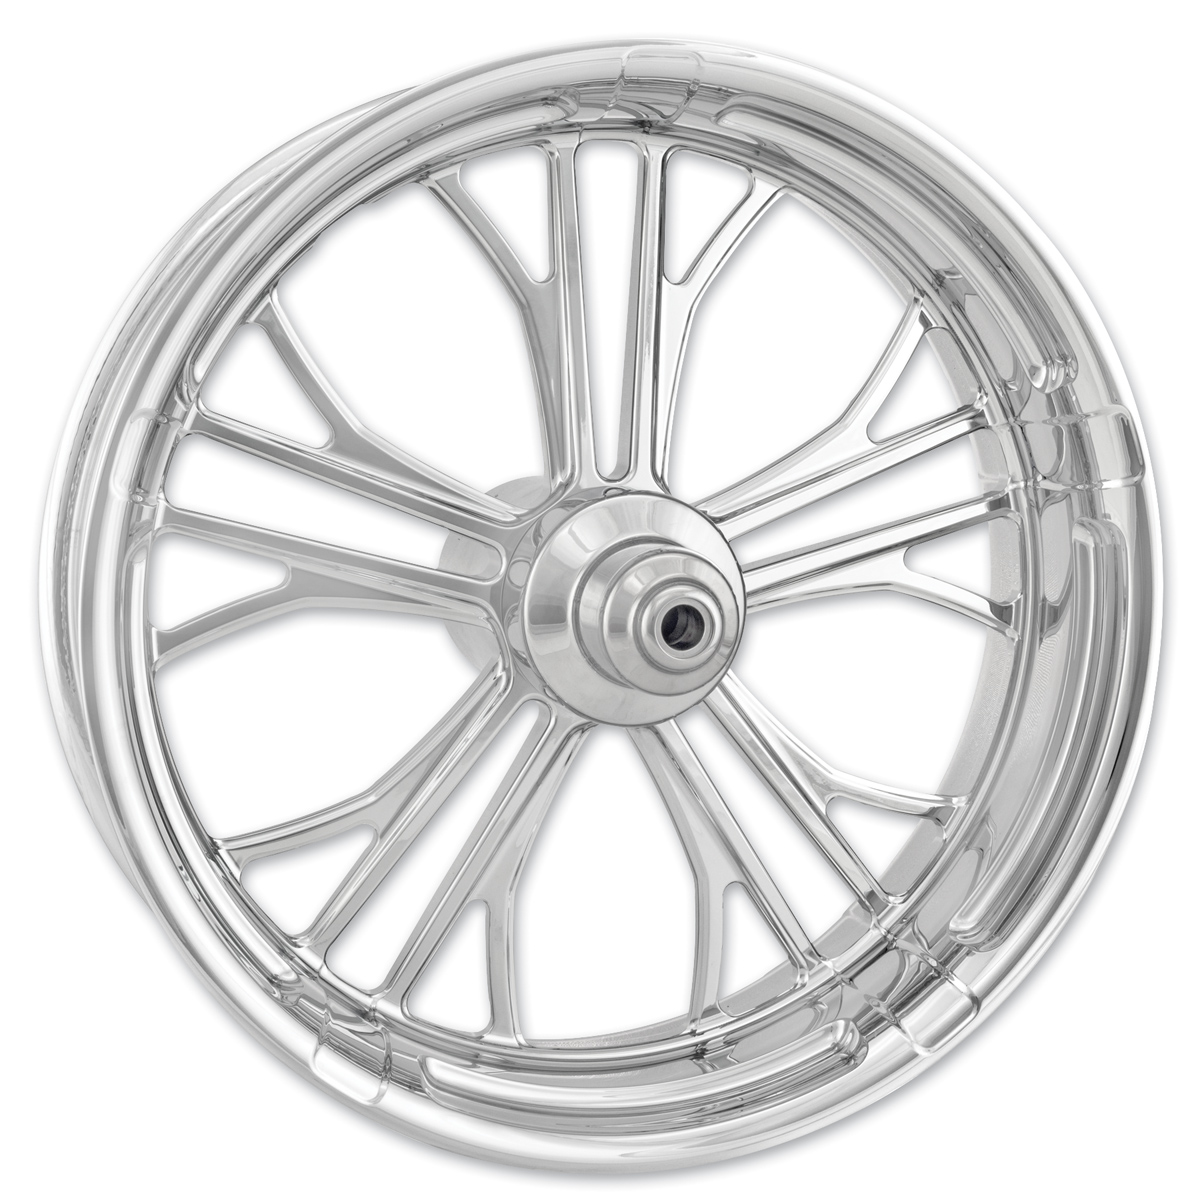 Performance Machine Wrath Platinum Cut Front Wheel 21x3.5